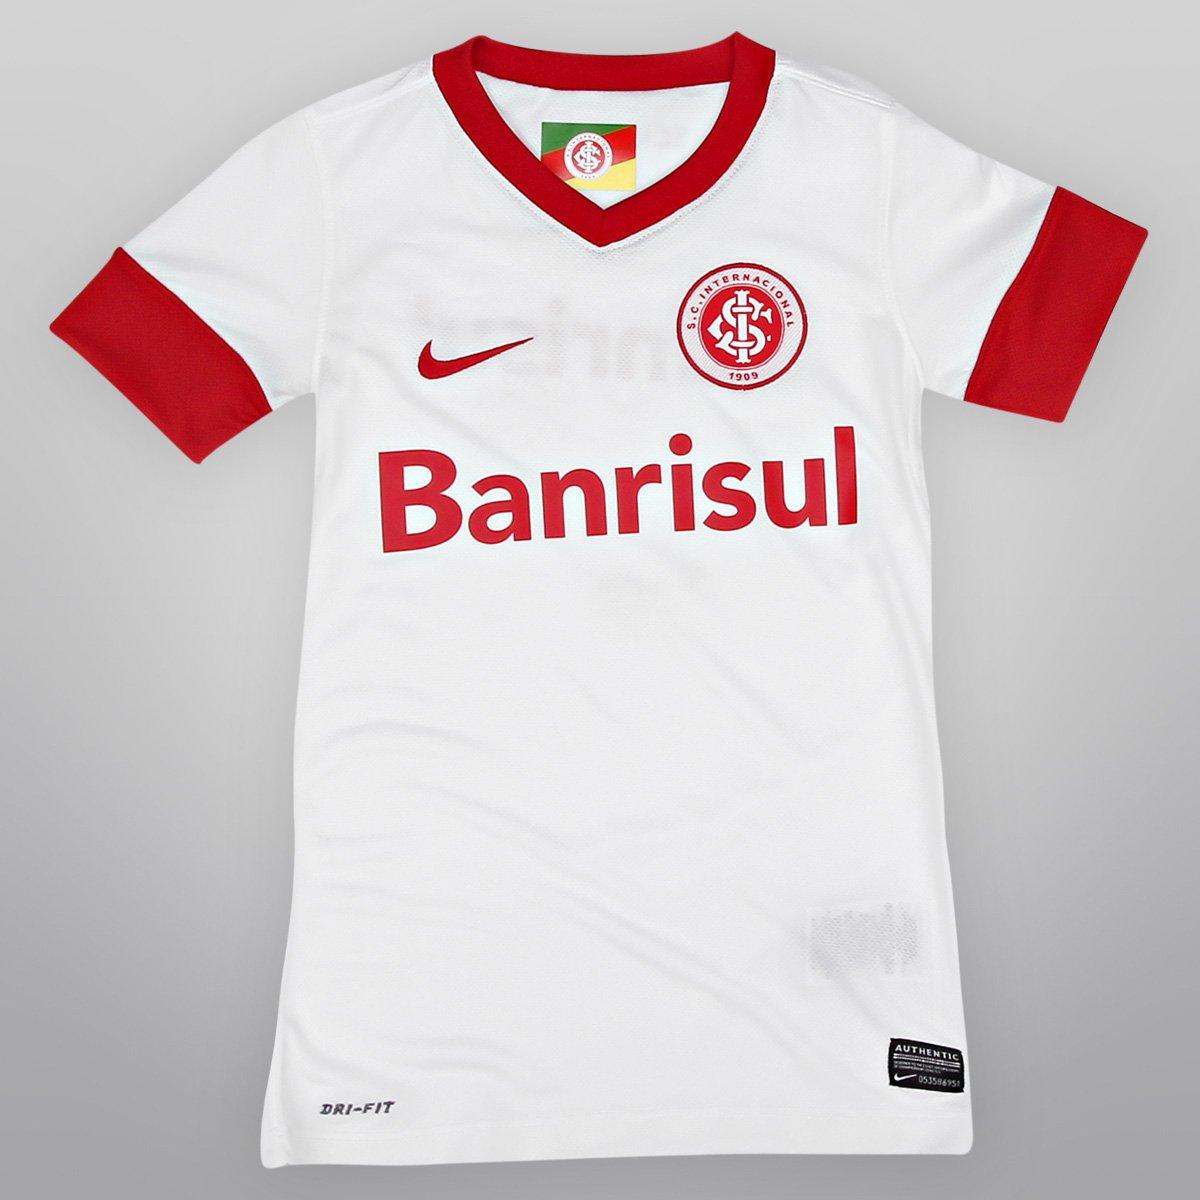 fd13be7ec7 Camisa Nike Internacional II 12 13 s nº Infantil - Compre Agora ...